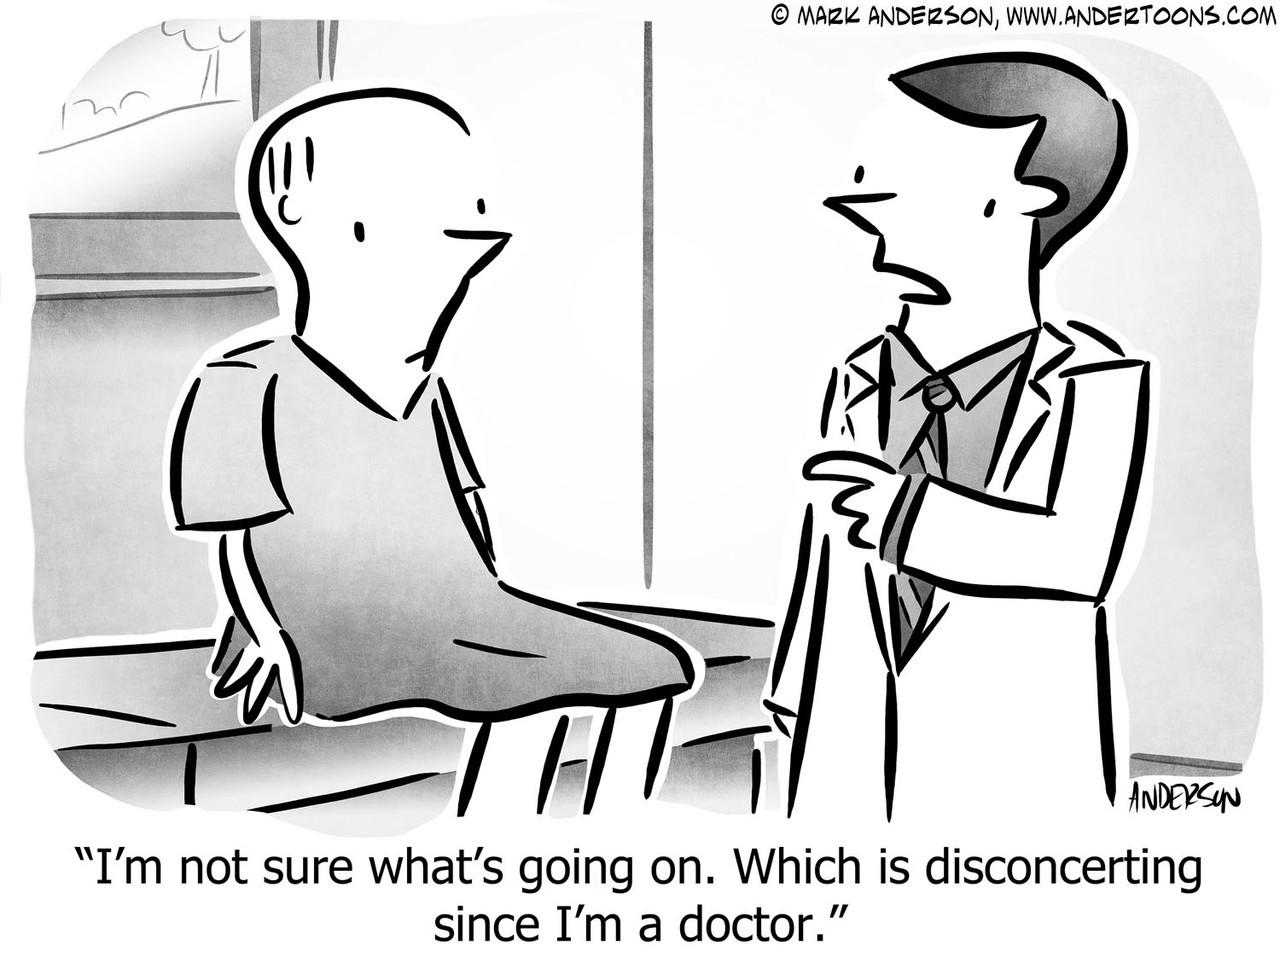 Incompetent Cartoon # 8035 - ANDERTOONS